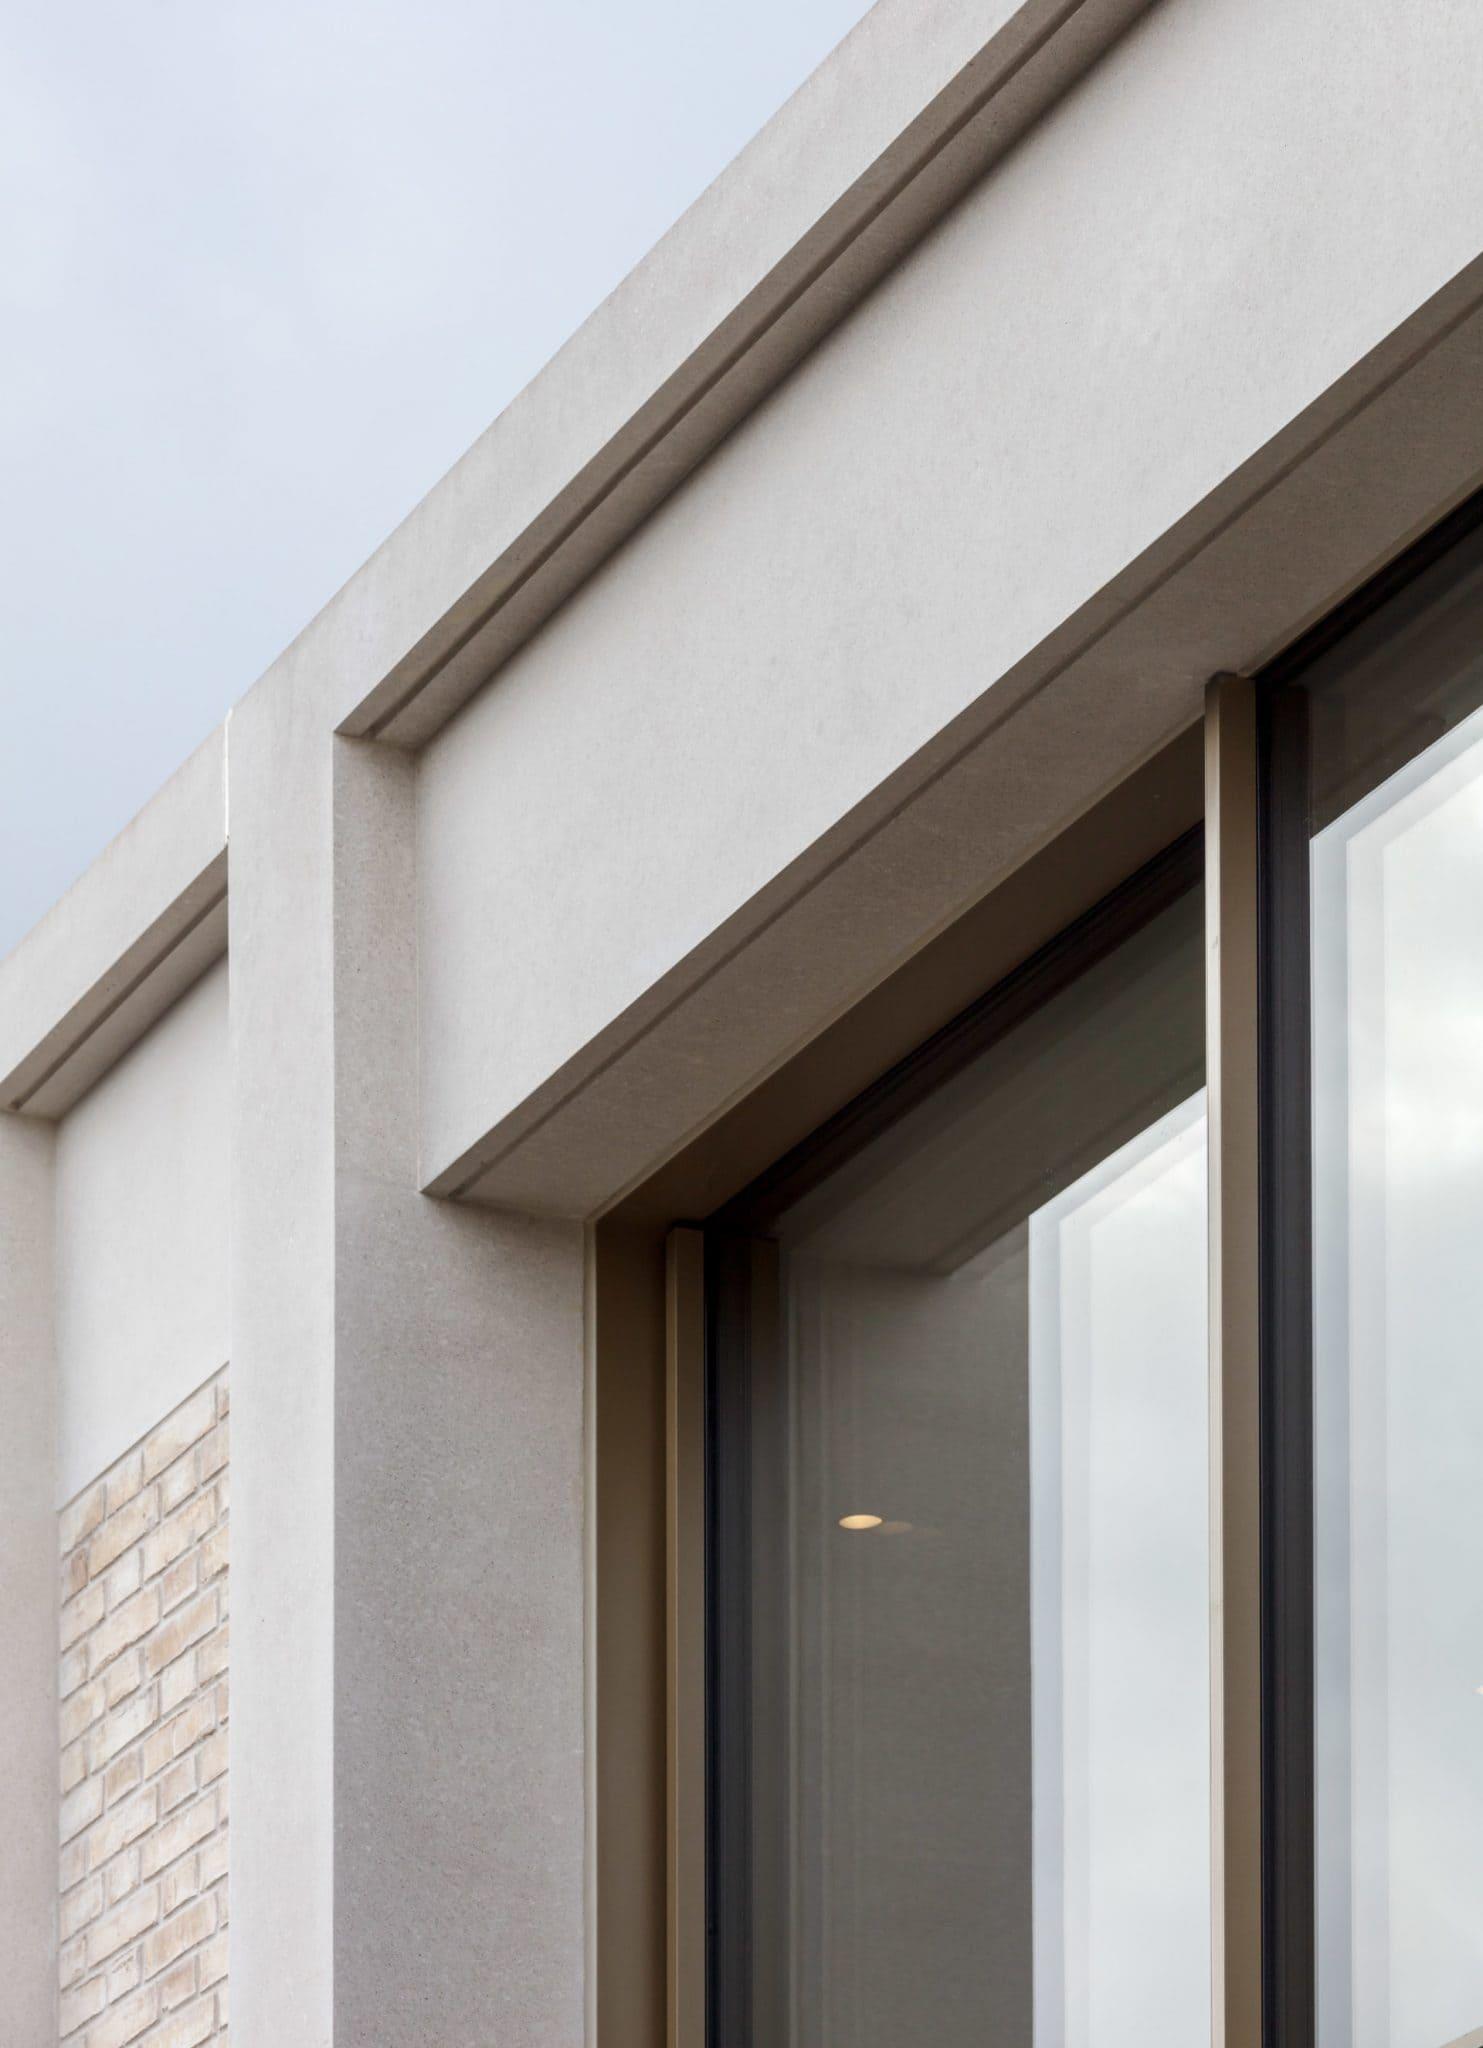 Aluminium window meeting stone